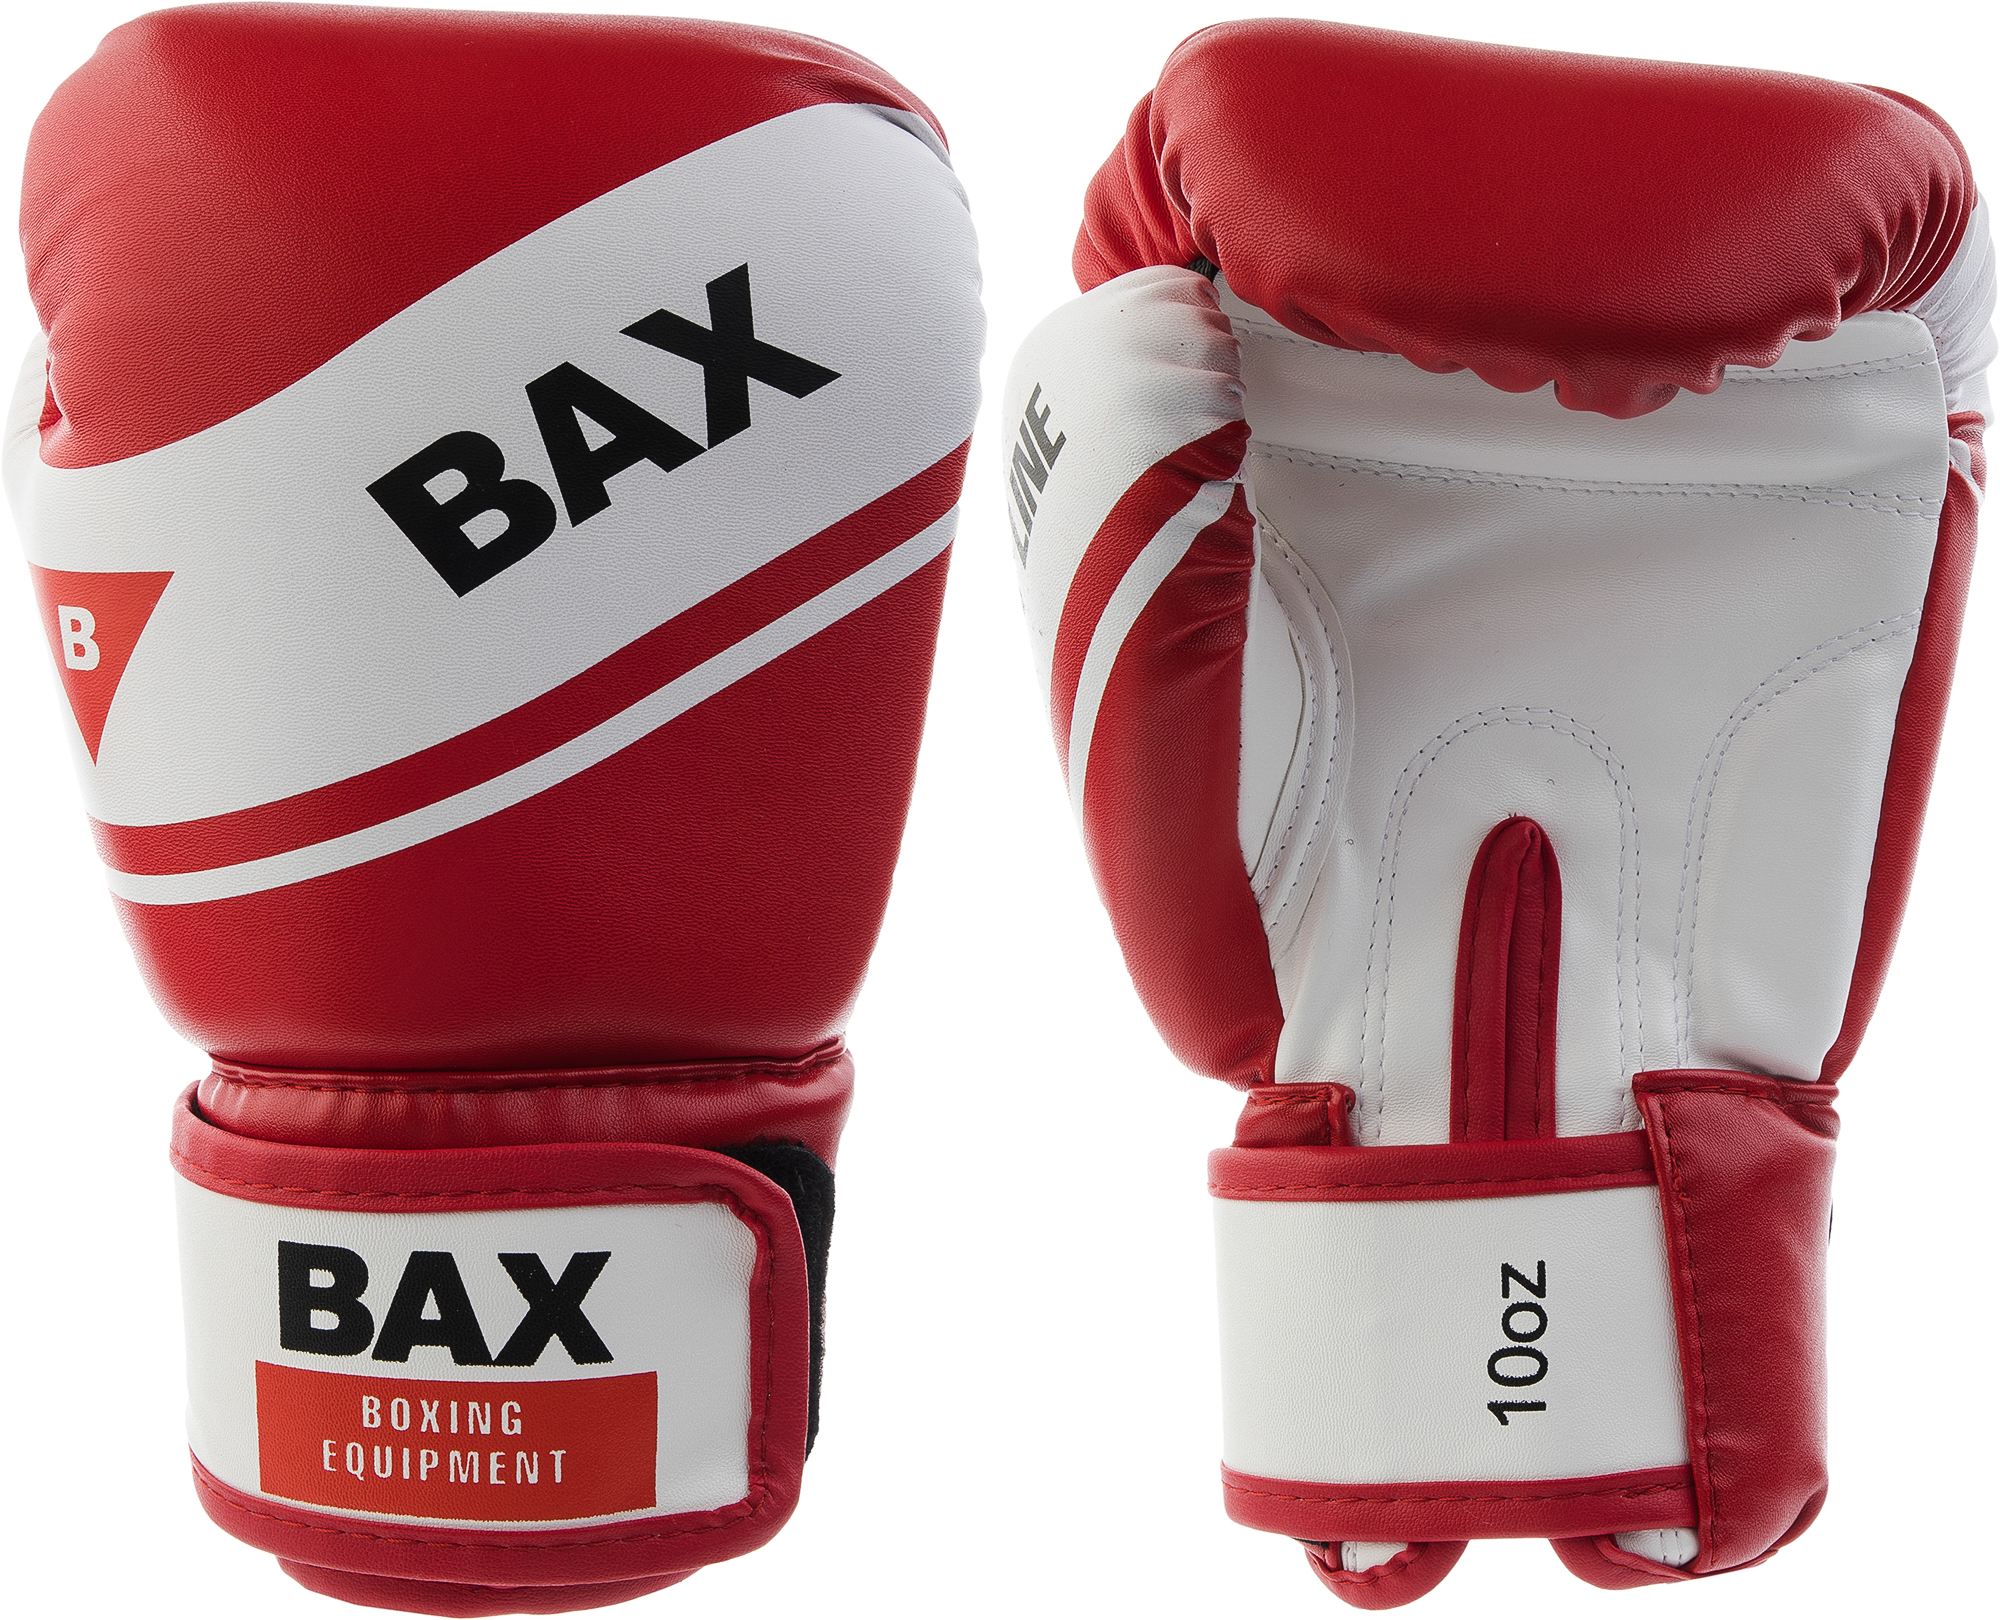 Bax Перчатки боксерские BAX, размер 10 oz